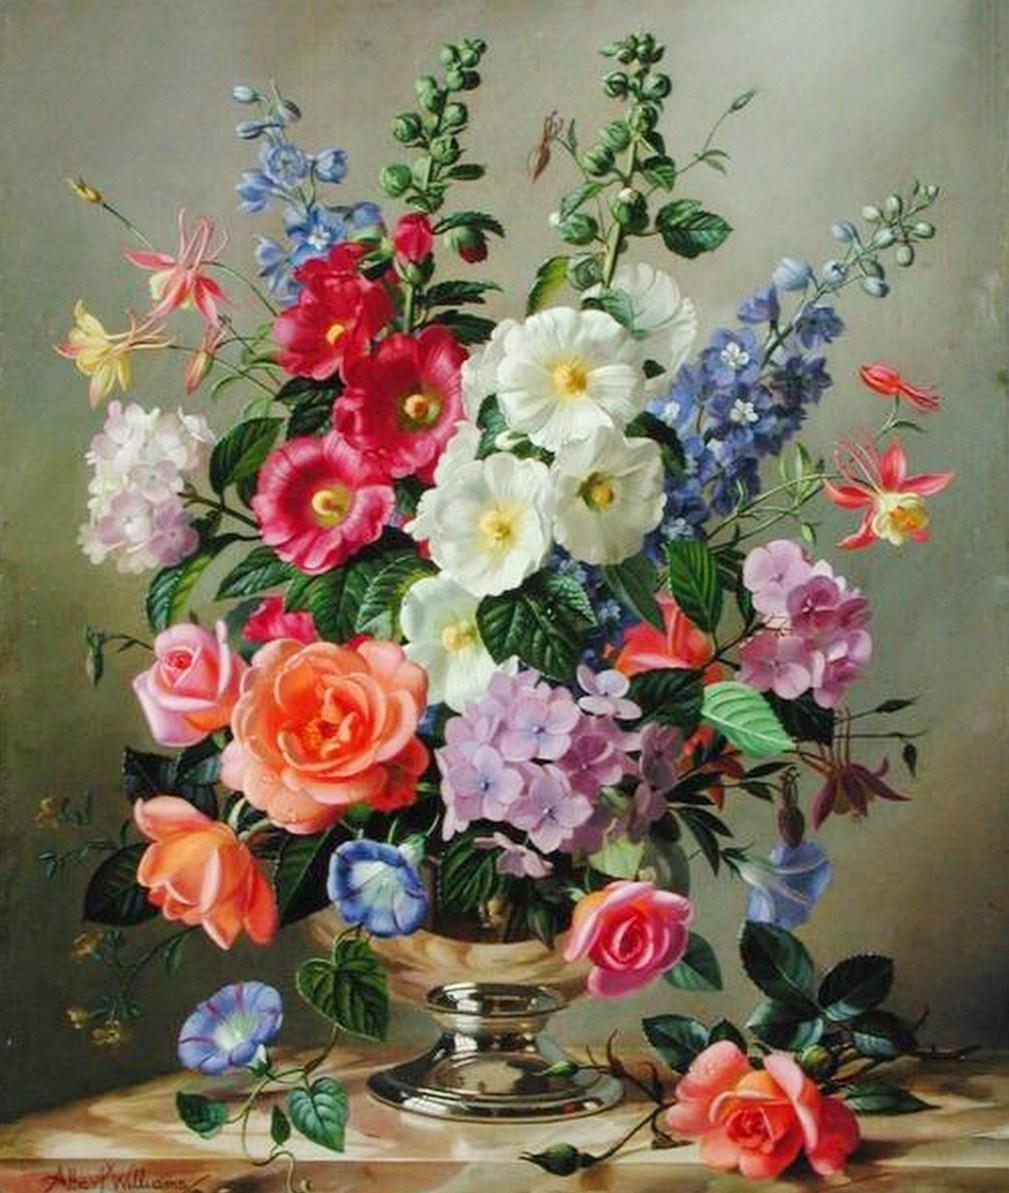 imágenes pintadas de flores AliExpress en español - Imagenes De Flores Pintadas En Oleo